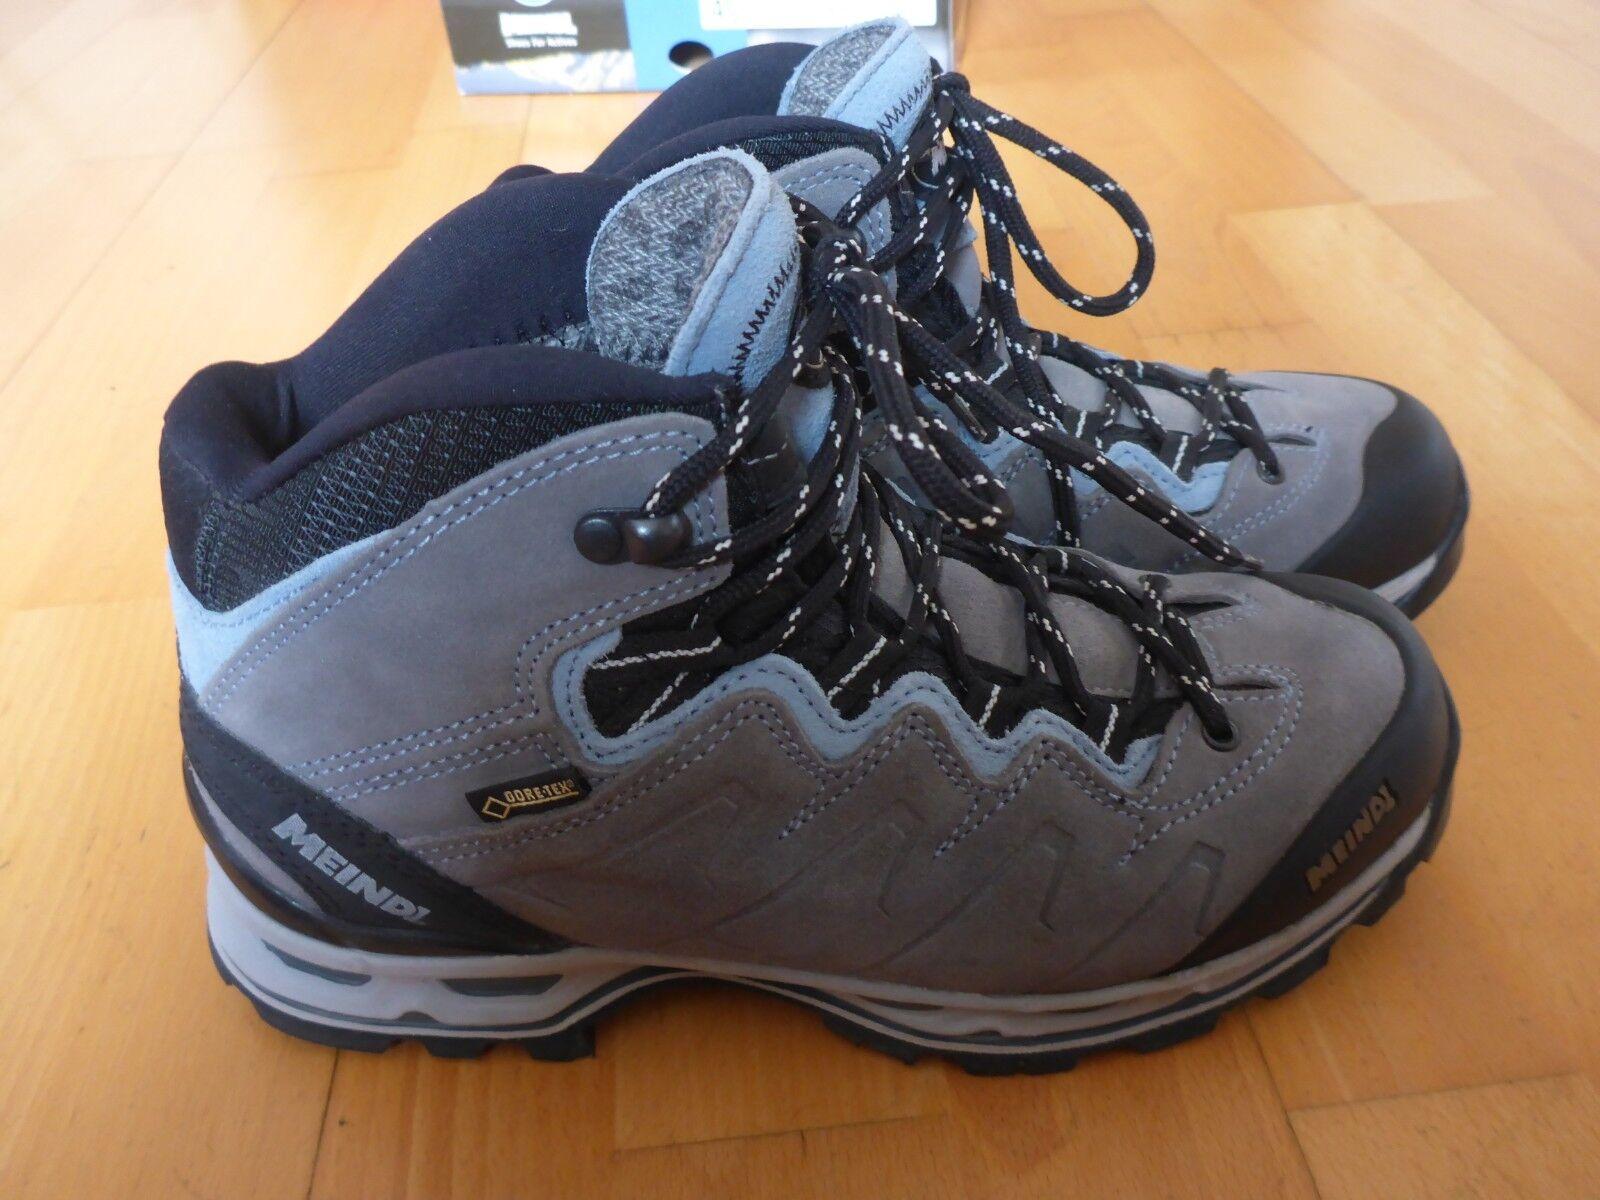 Meindl Minnesota Lady GT Gore Tex Trekkingschuhe Schuhe Gr 37,5 UK 4 1/2